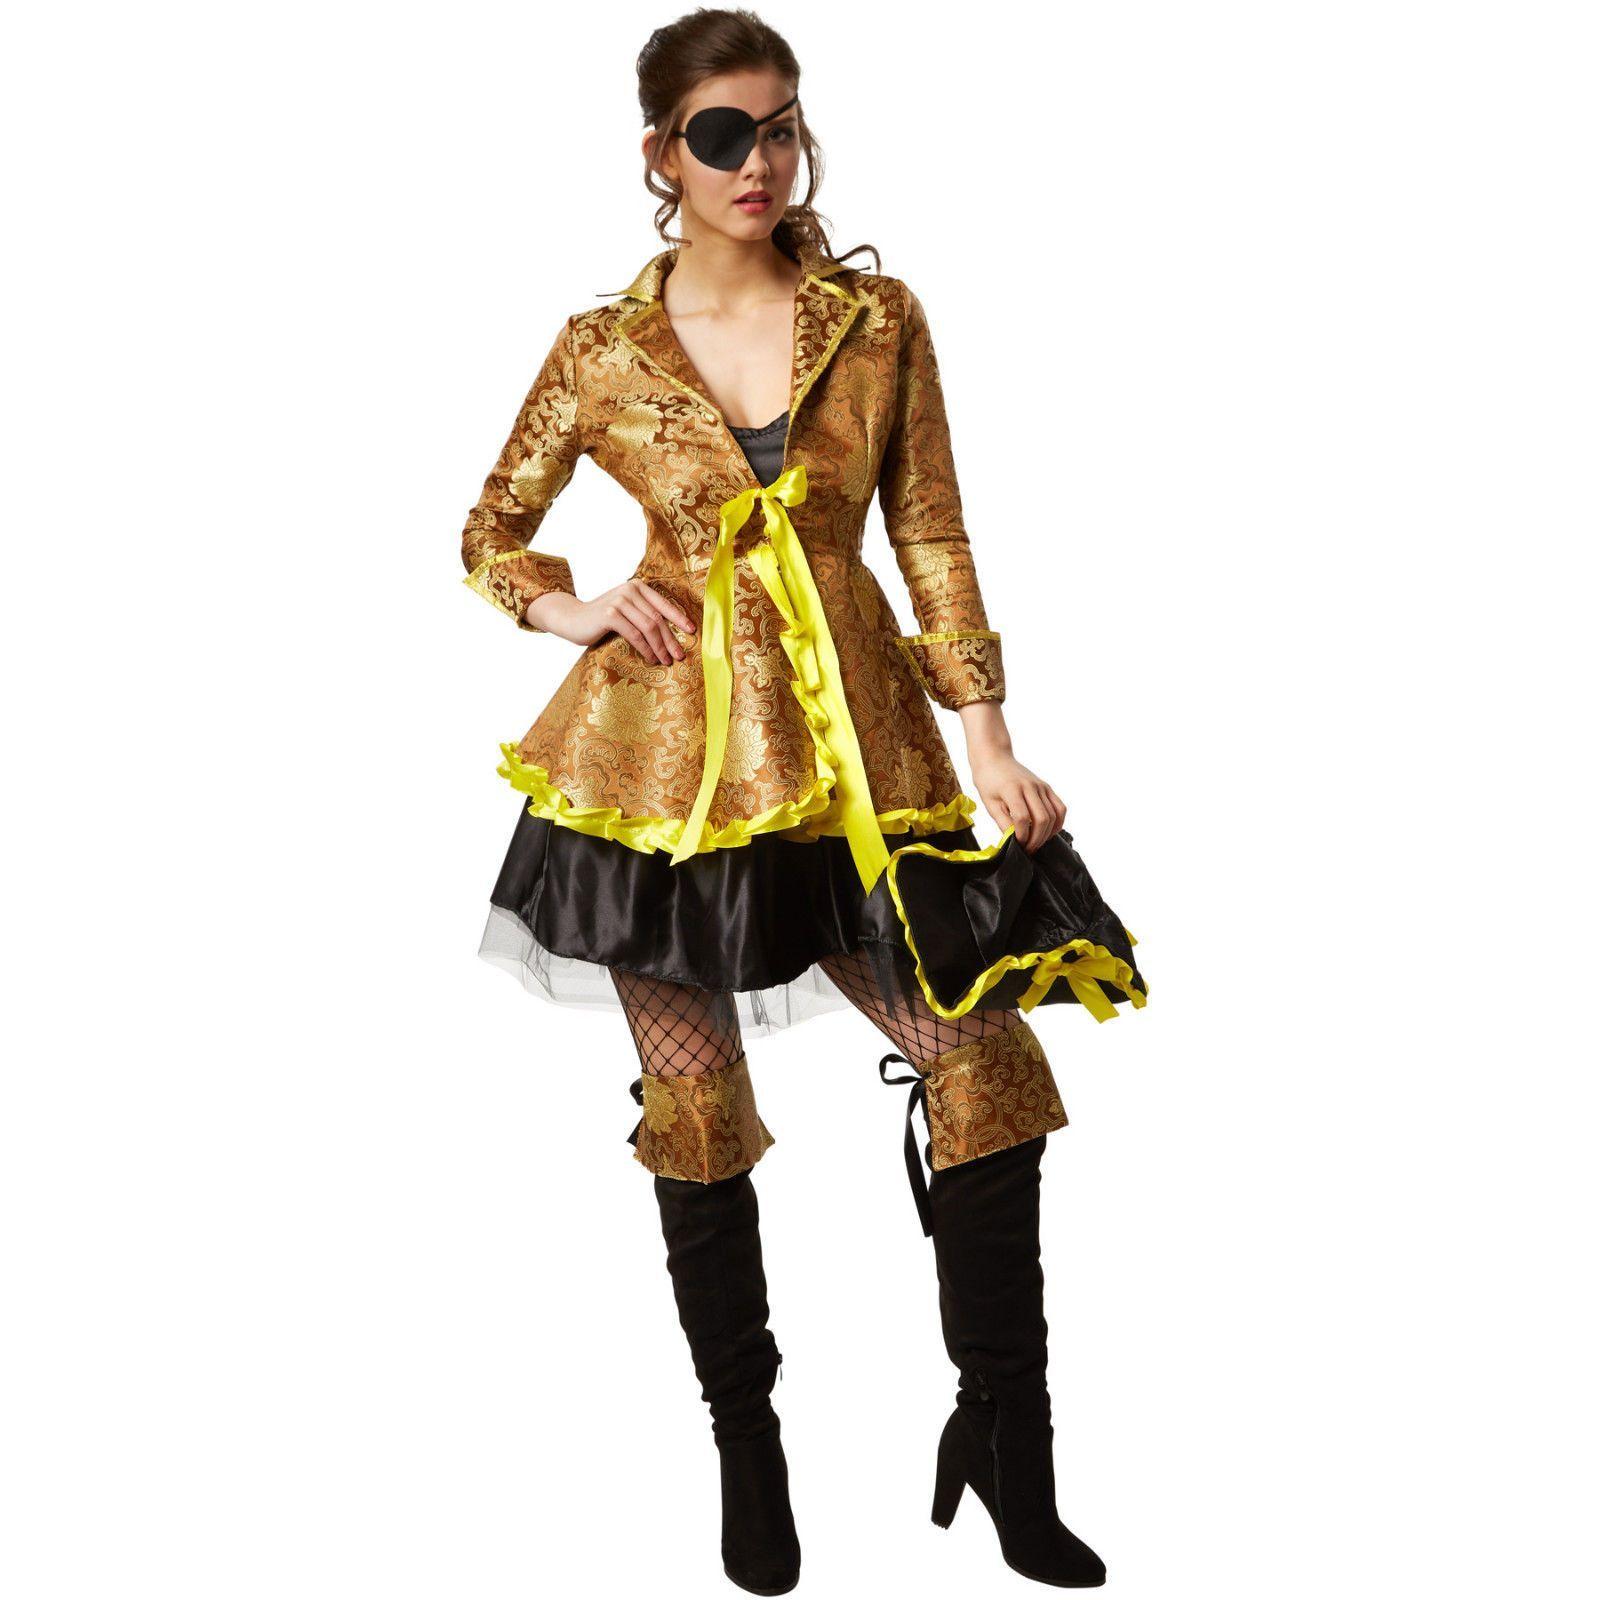 Fasching Damen Frisch Werbung Frauenkostüm Korsarin Piratenkostüm Seeräuber